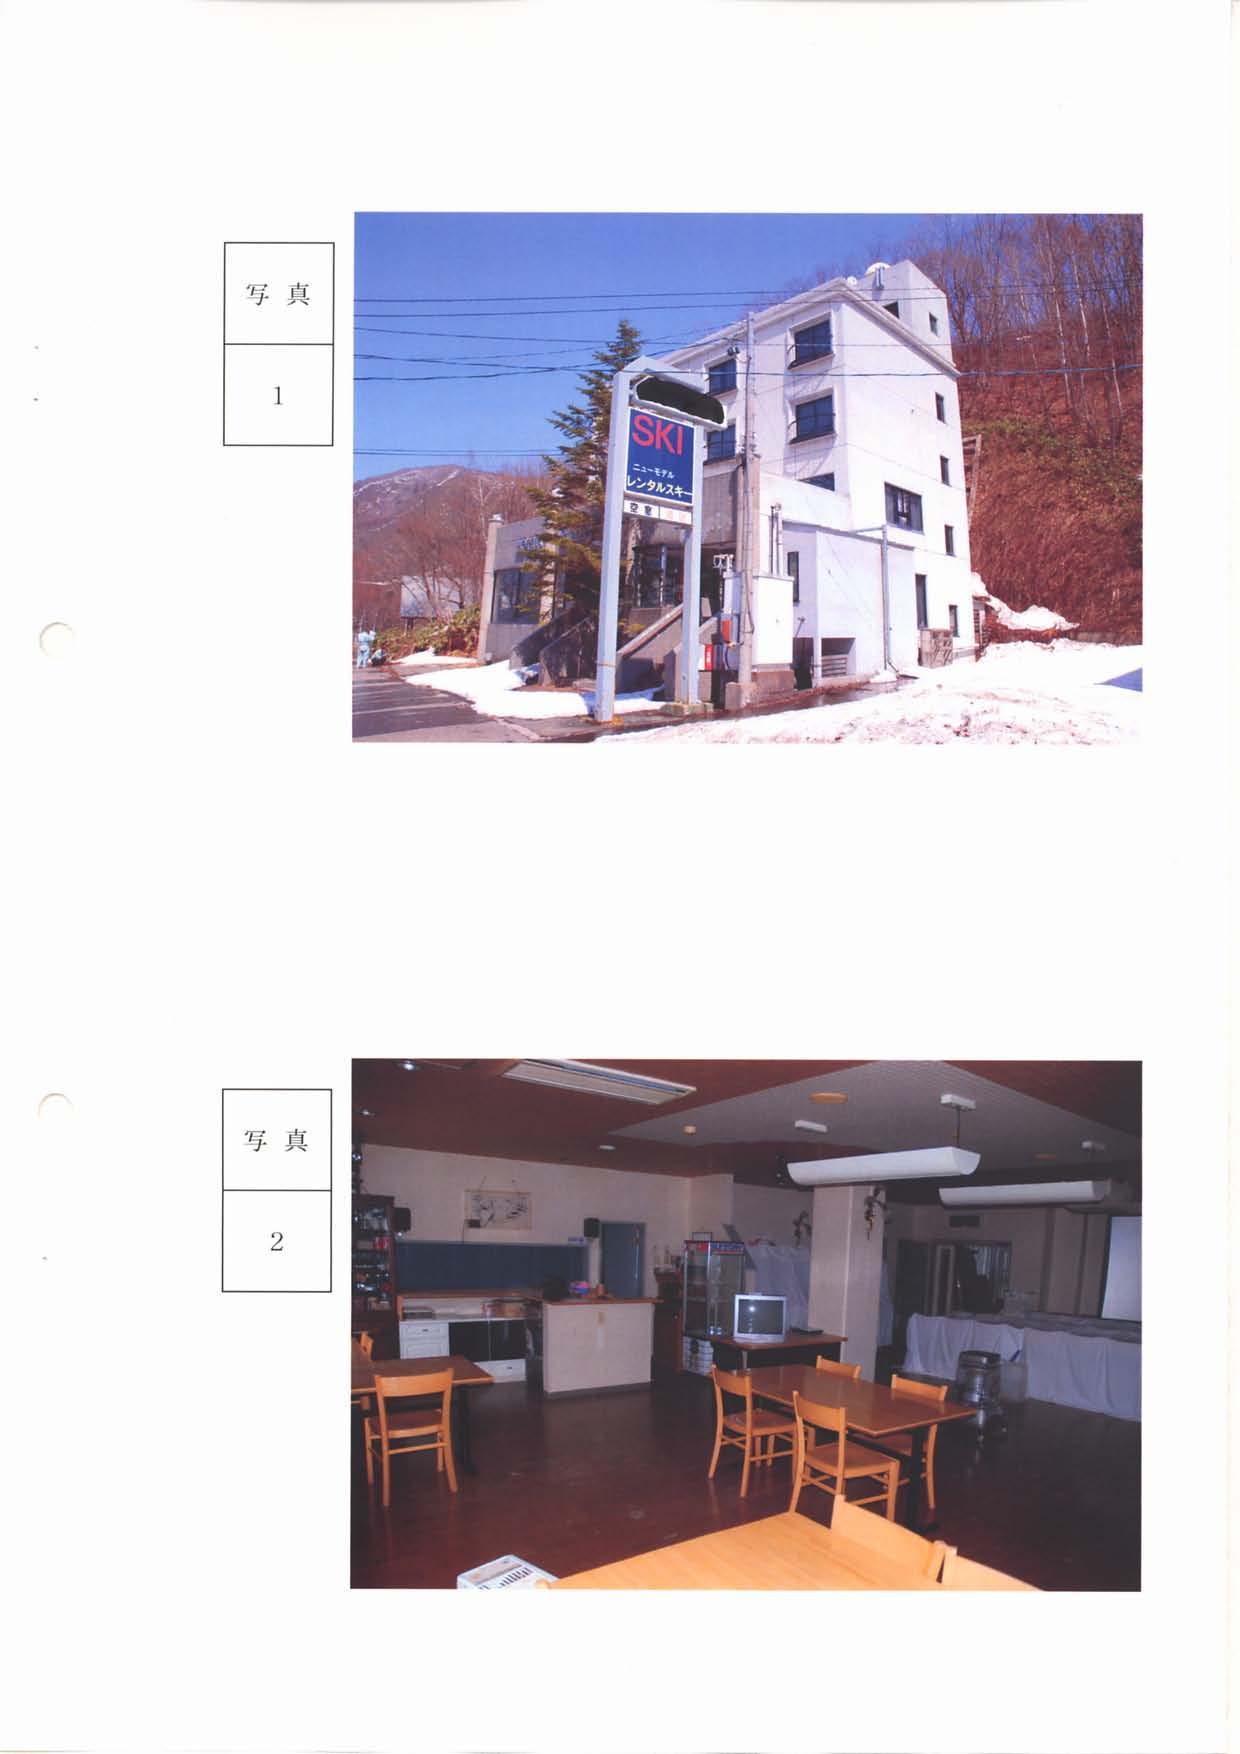 Niigata Ski Property